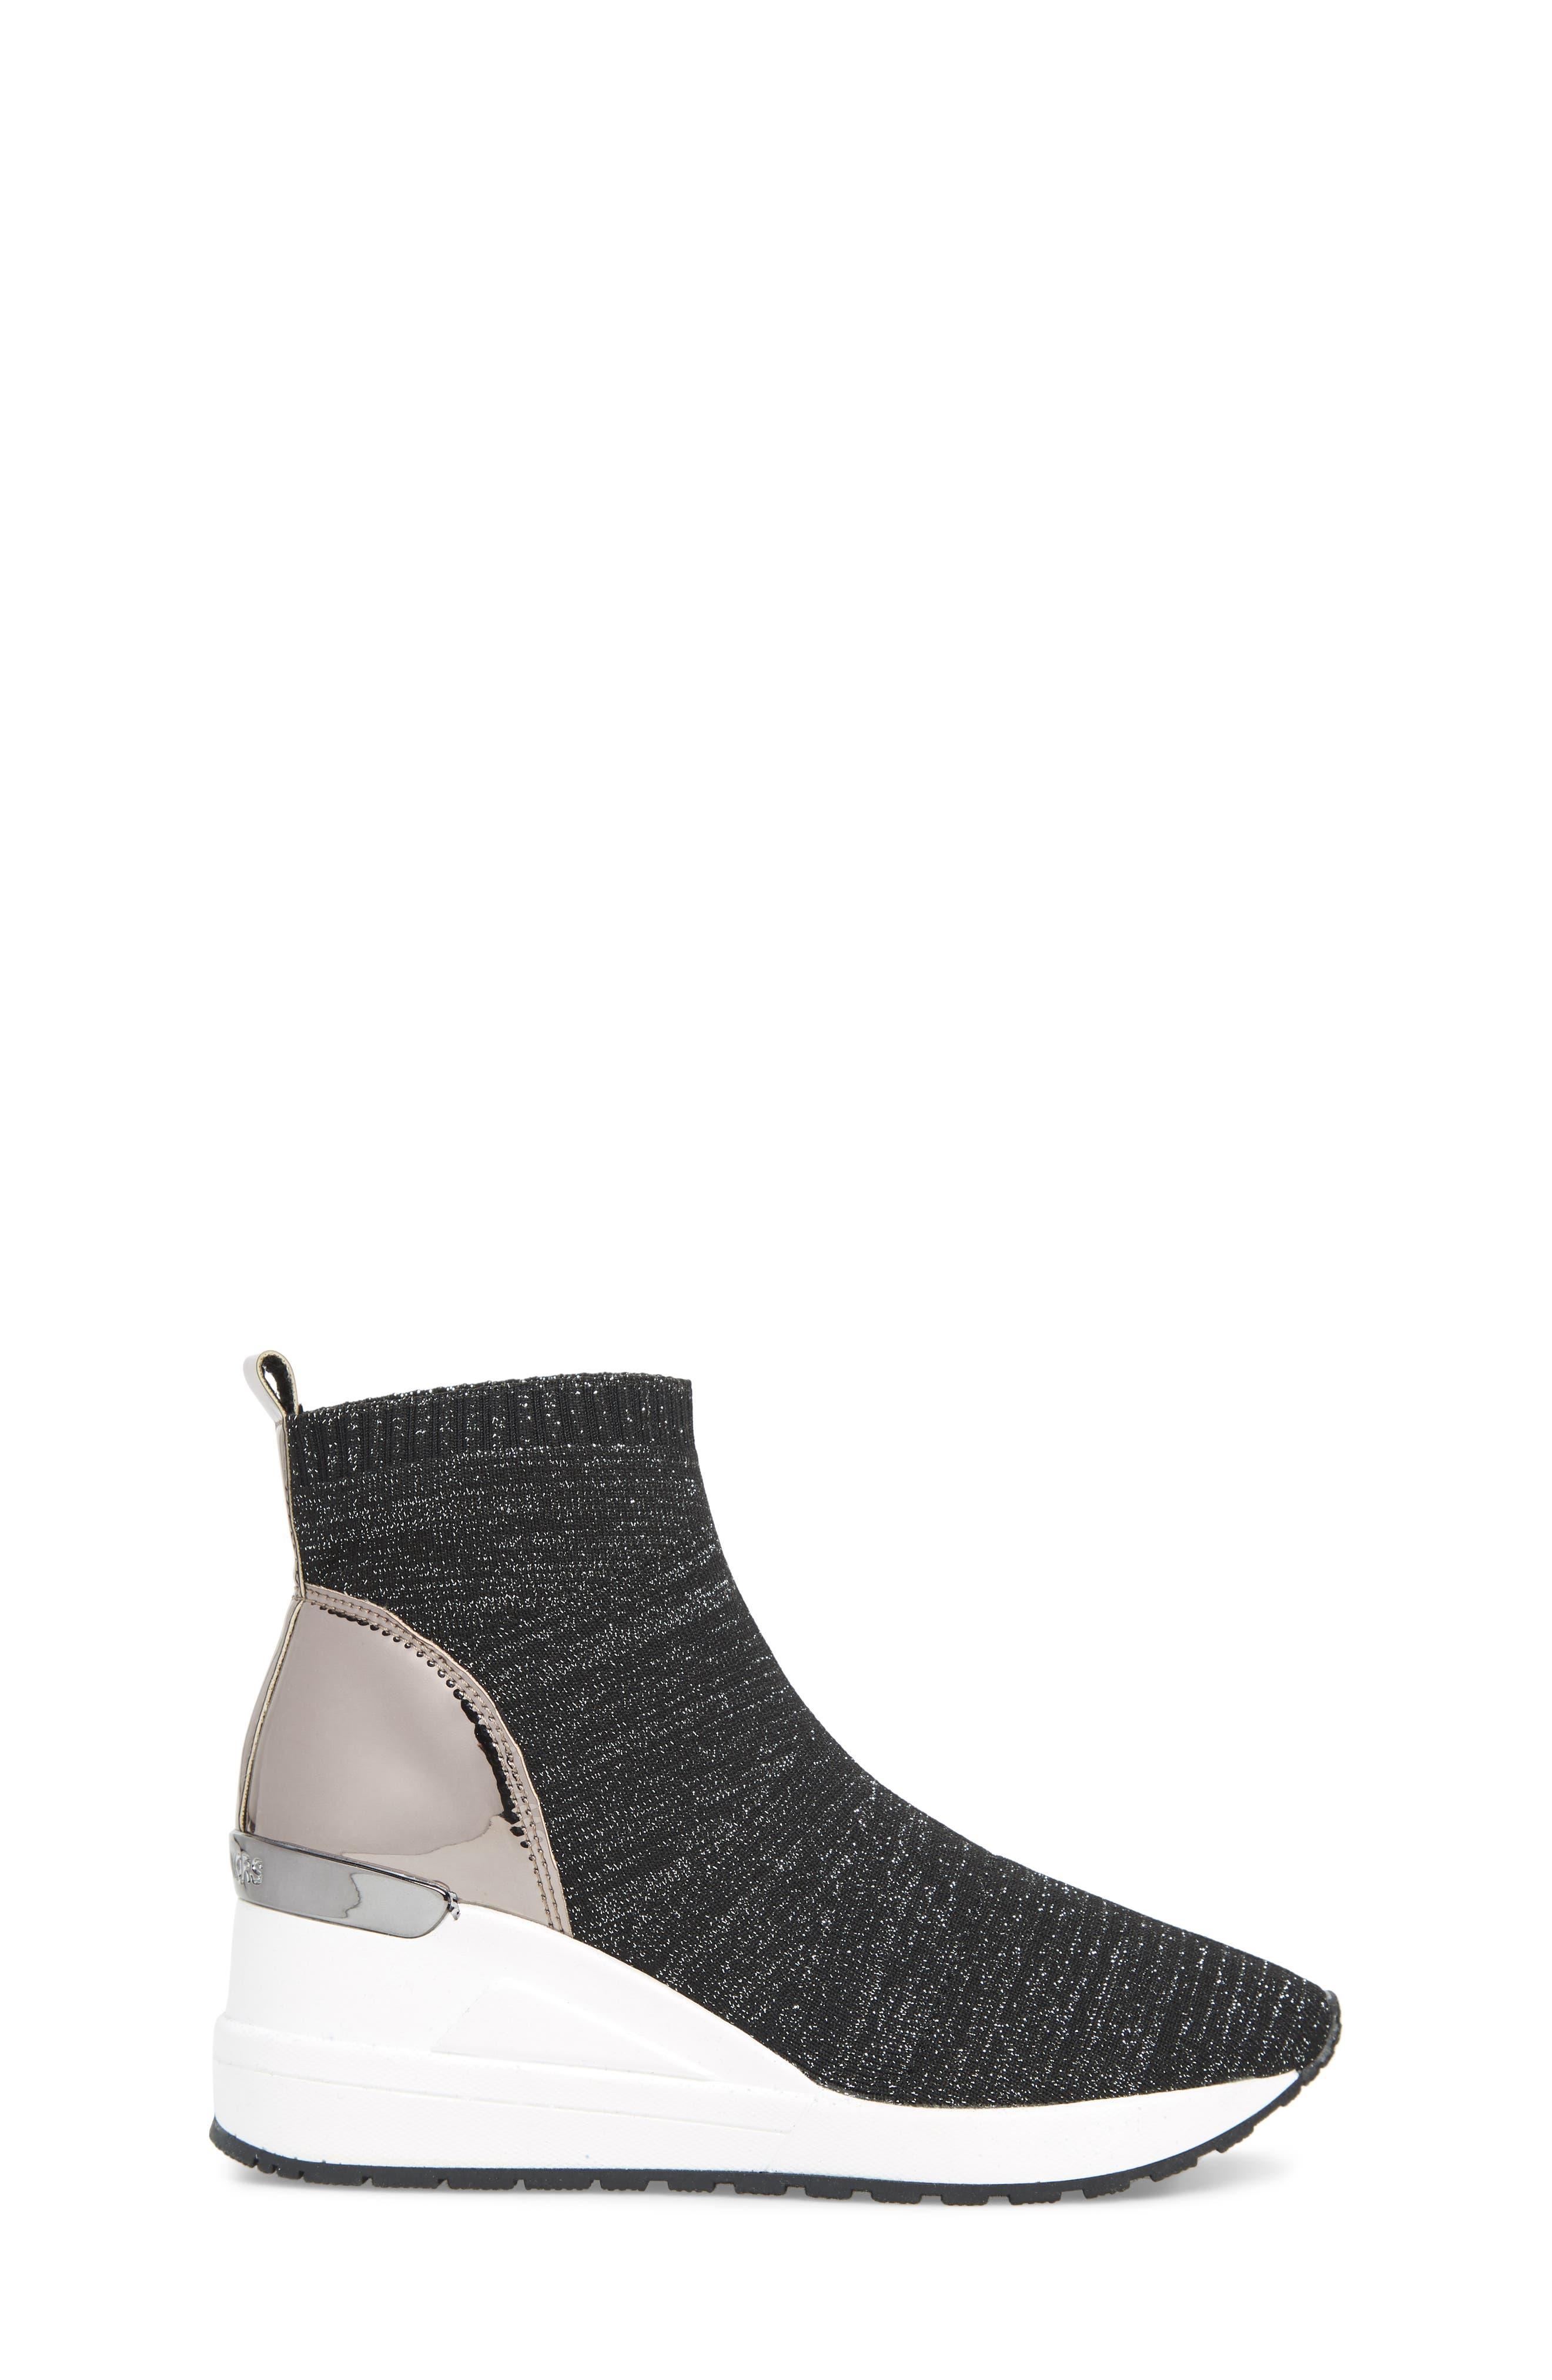 MICHAEL MICHAEL KORS, Neo Flex Metallic Wedge Sneaker, Alternate thumbnail 3, color, BLACK METALLIC